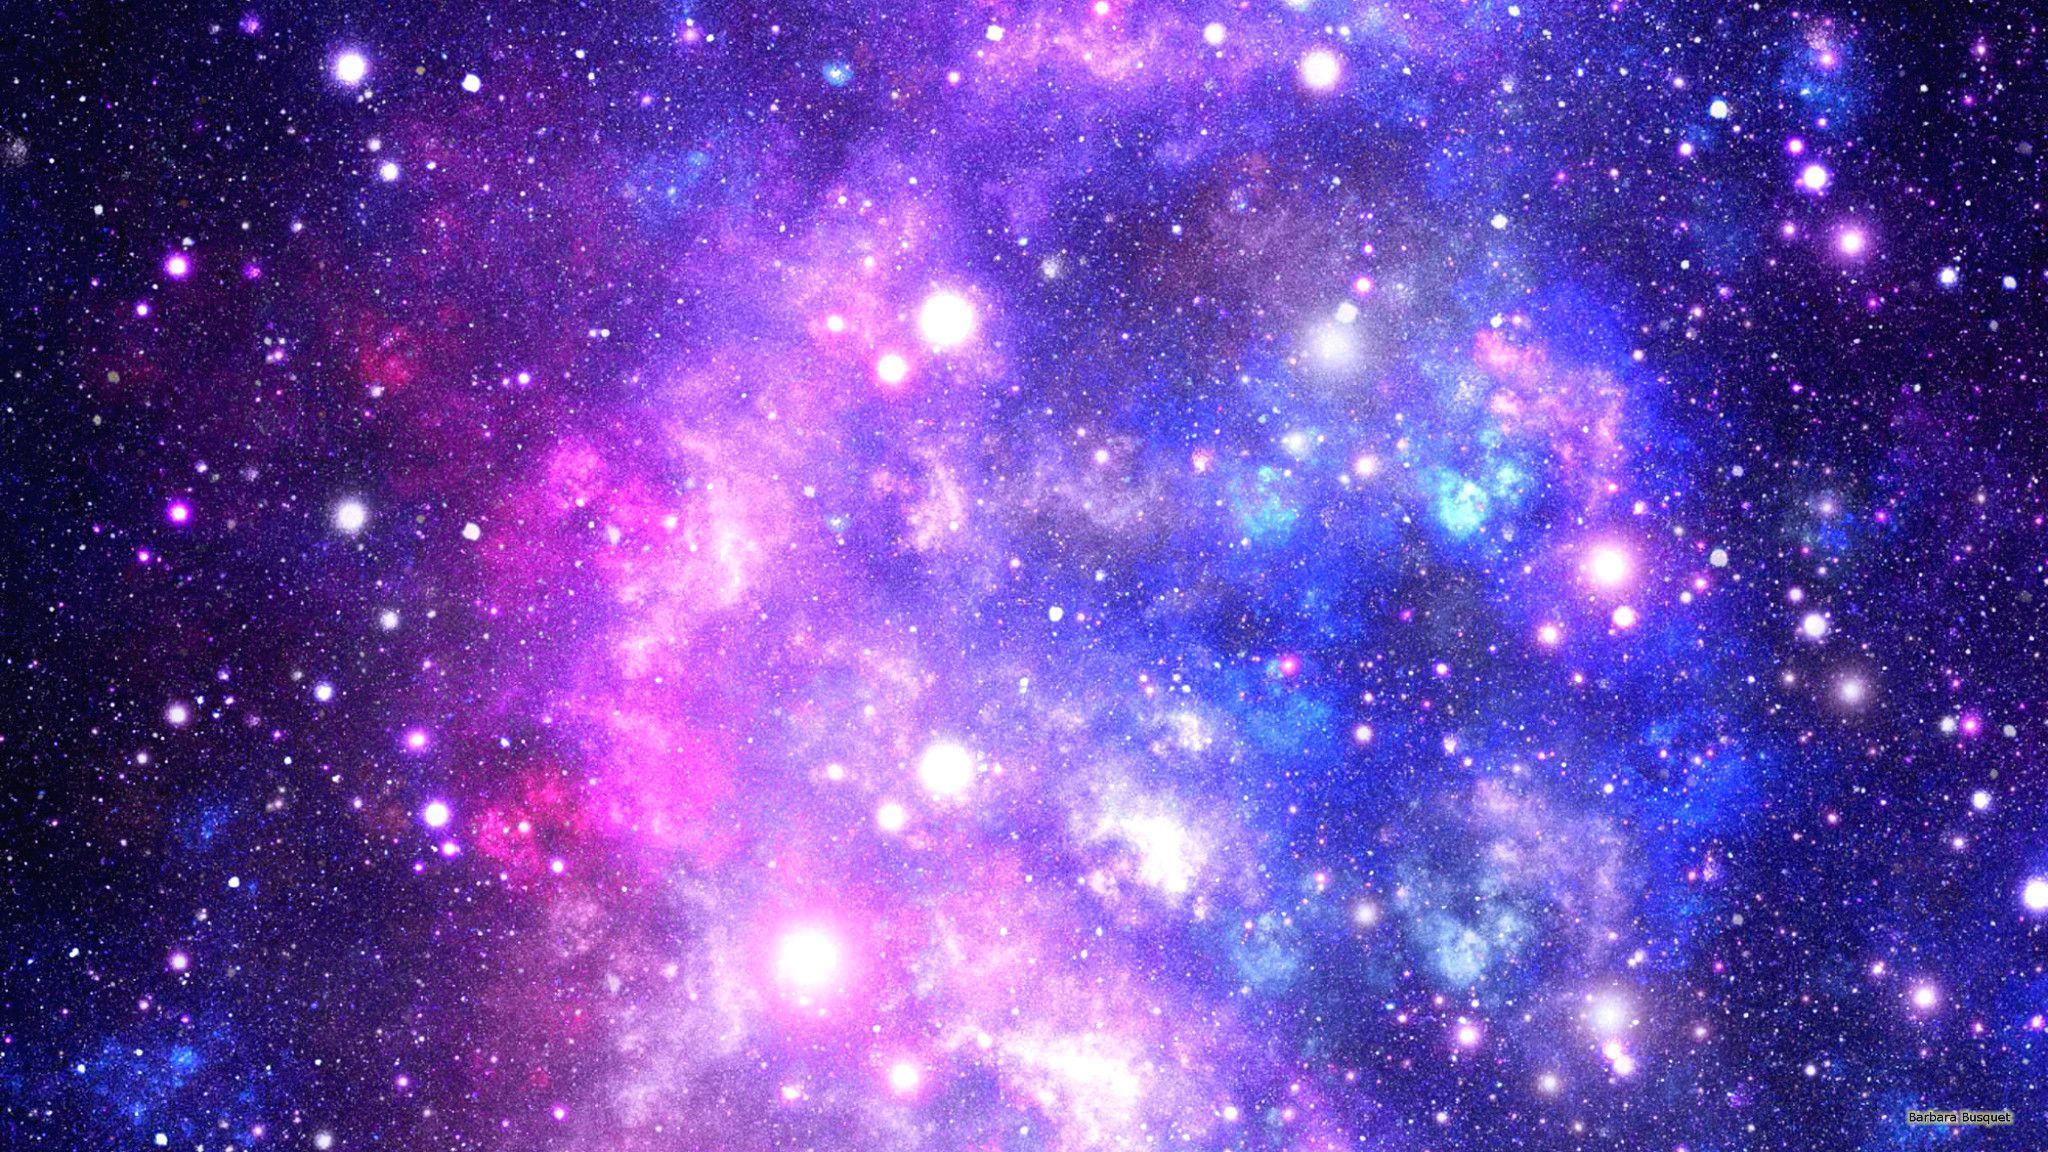 1280x720 4K Space Galaxy